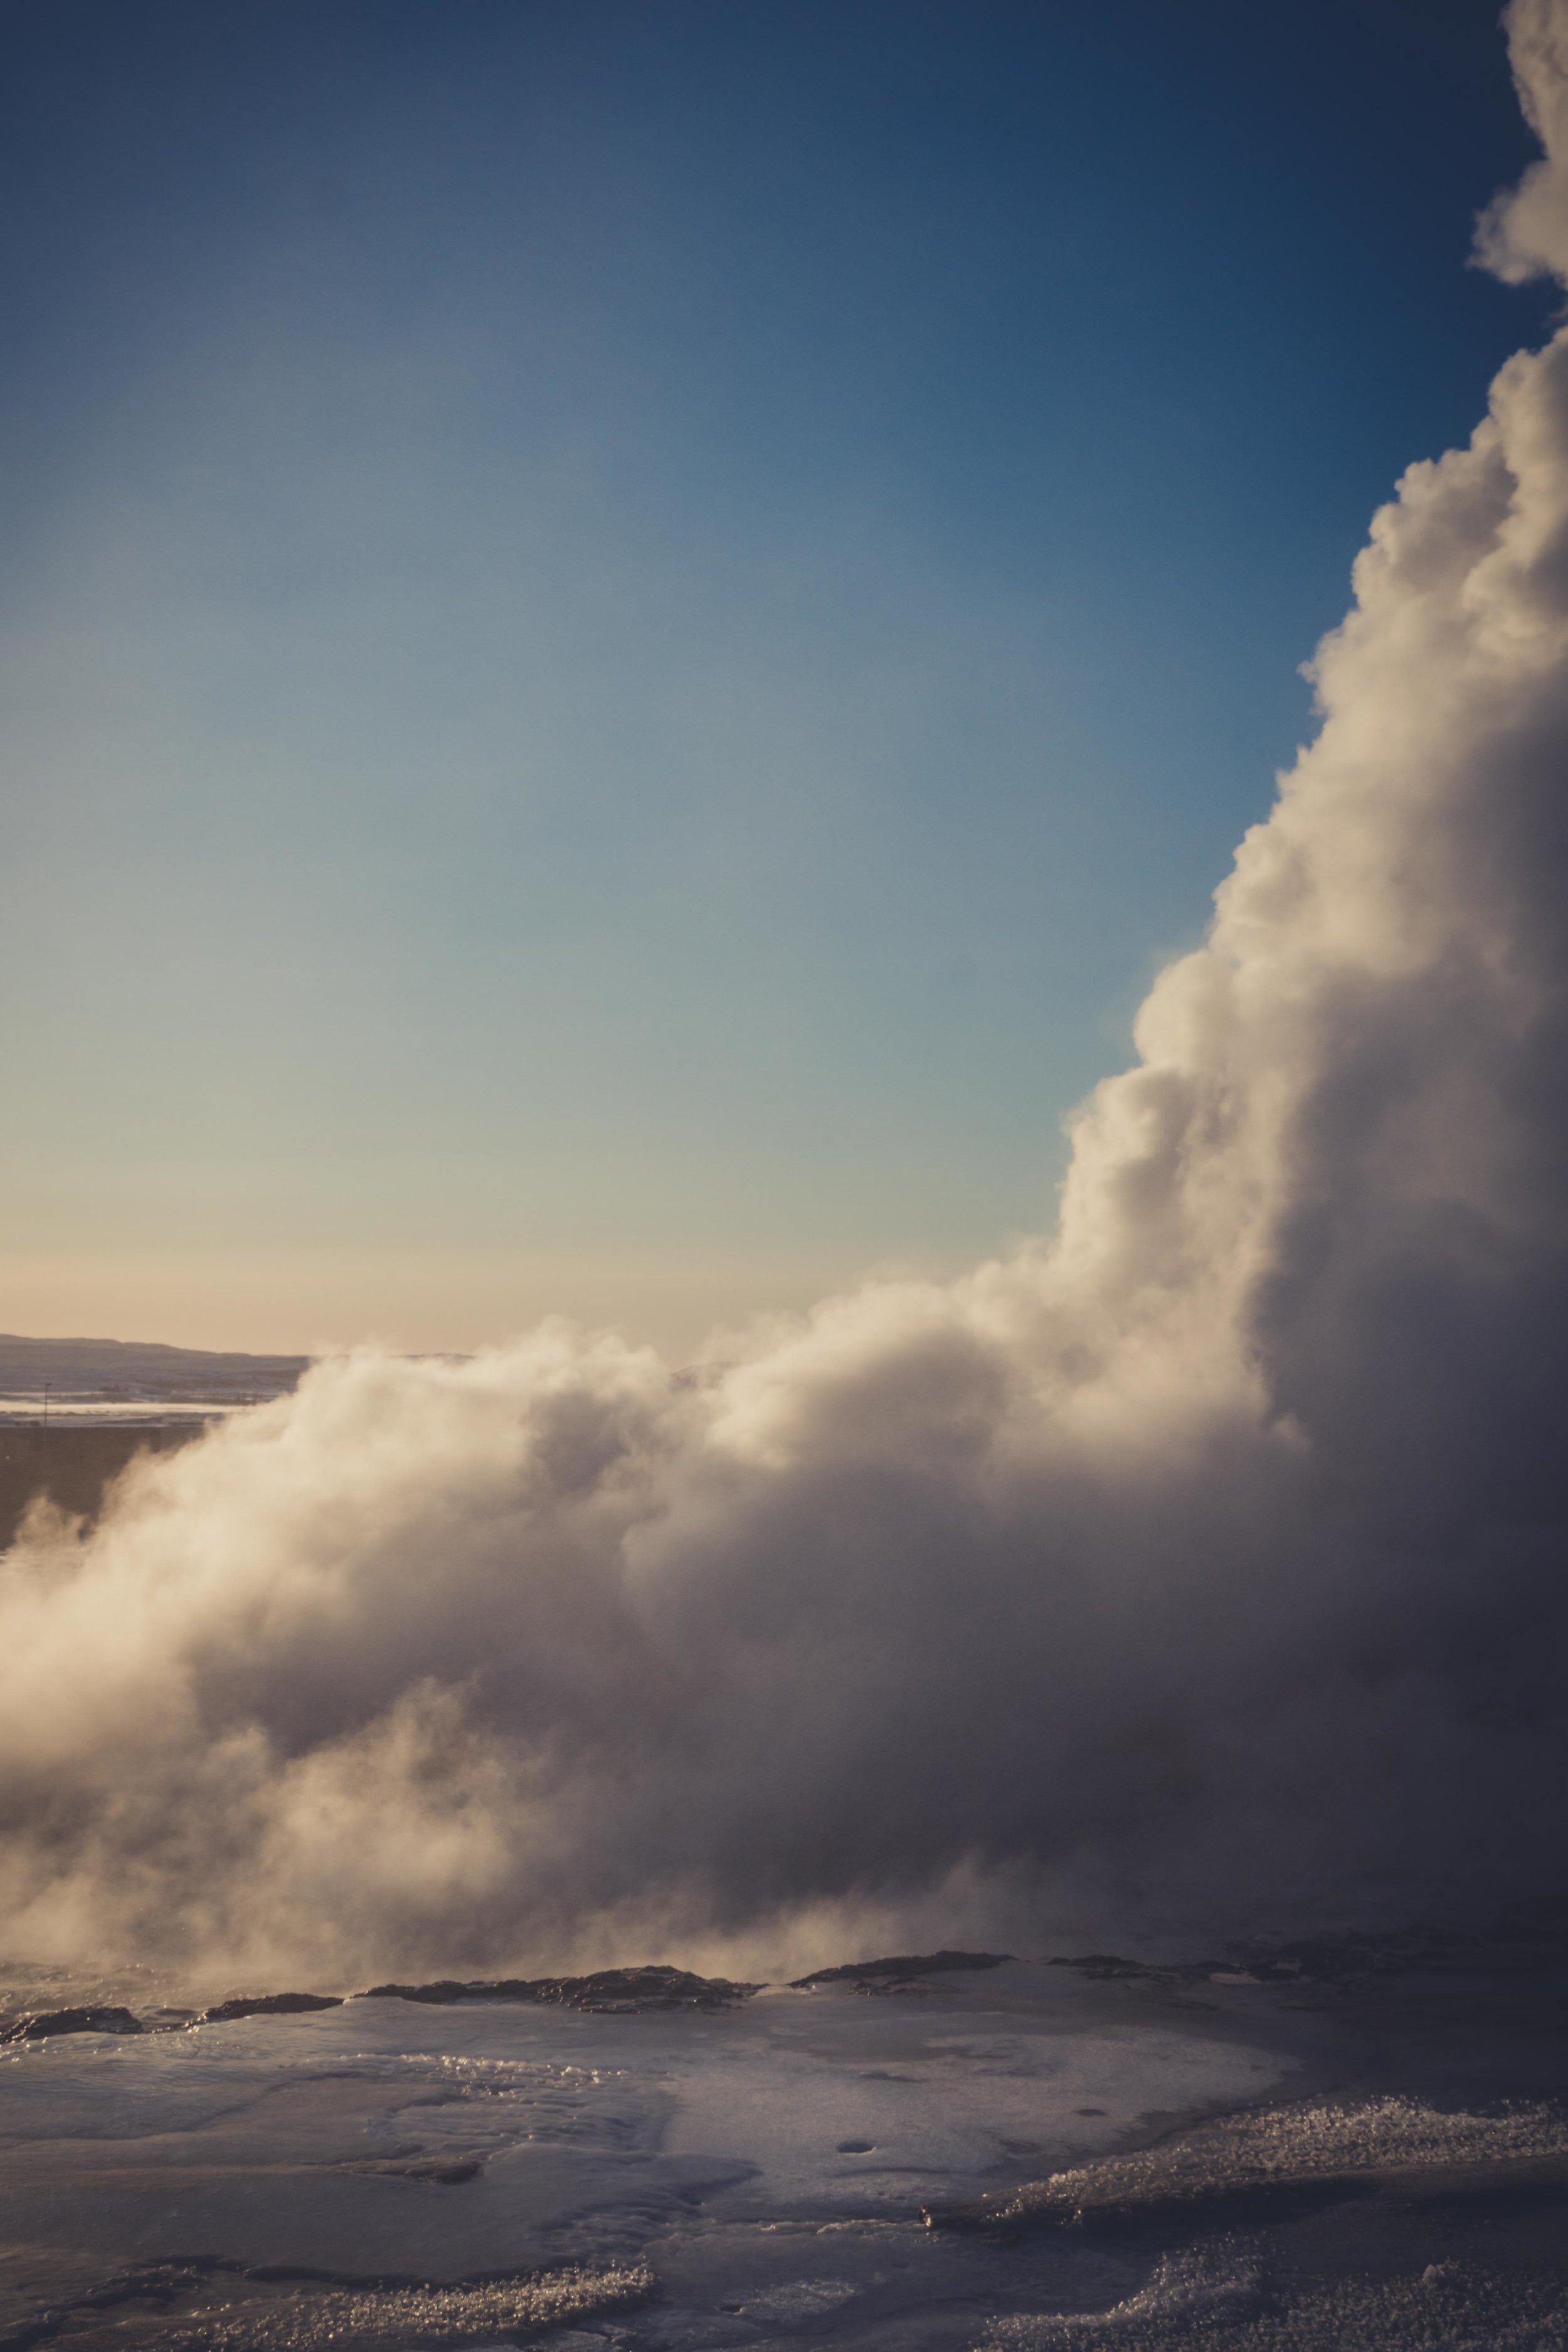 Iceland. snow. travel. adventure. photography. trip. epic landscape. snow. cold. freezing. sunrise. long exposure selfie. blow hole..jpg